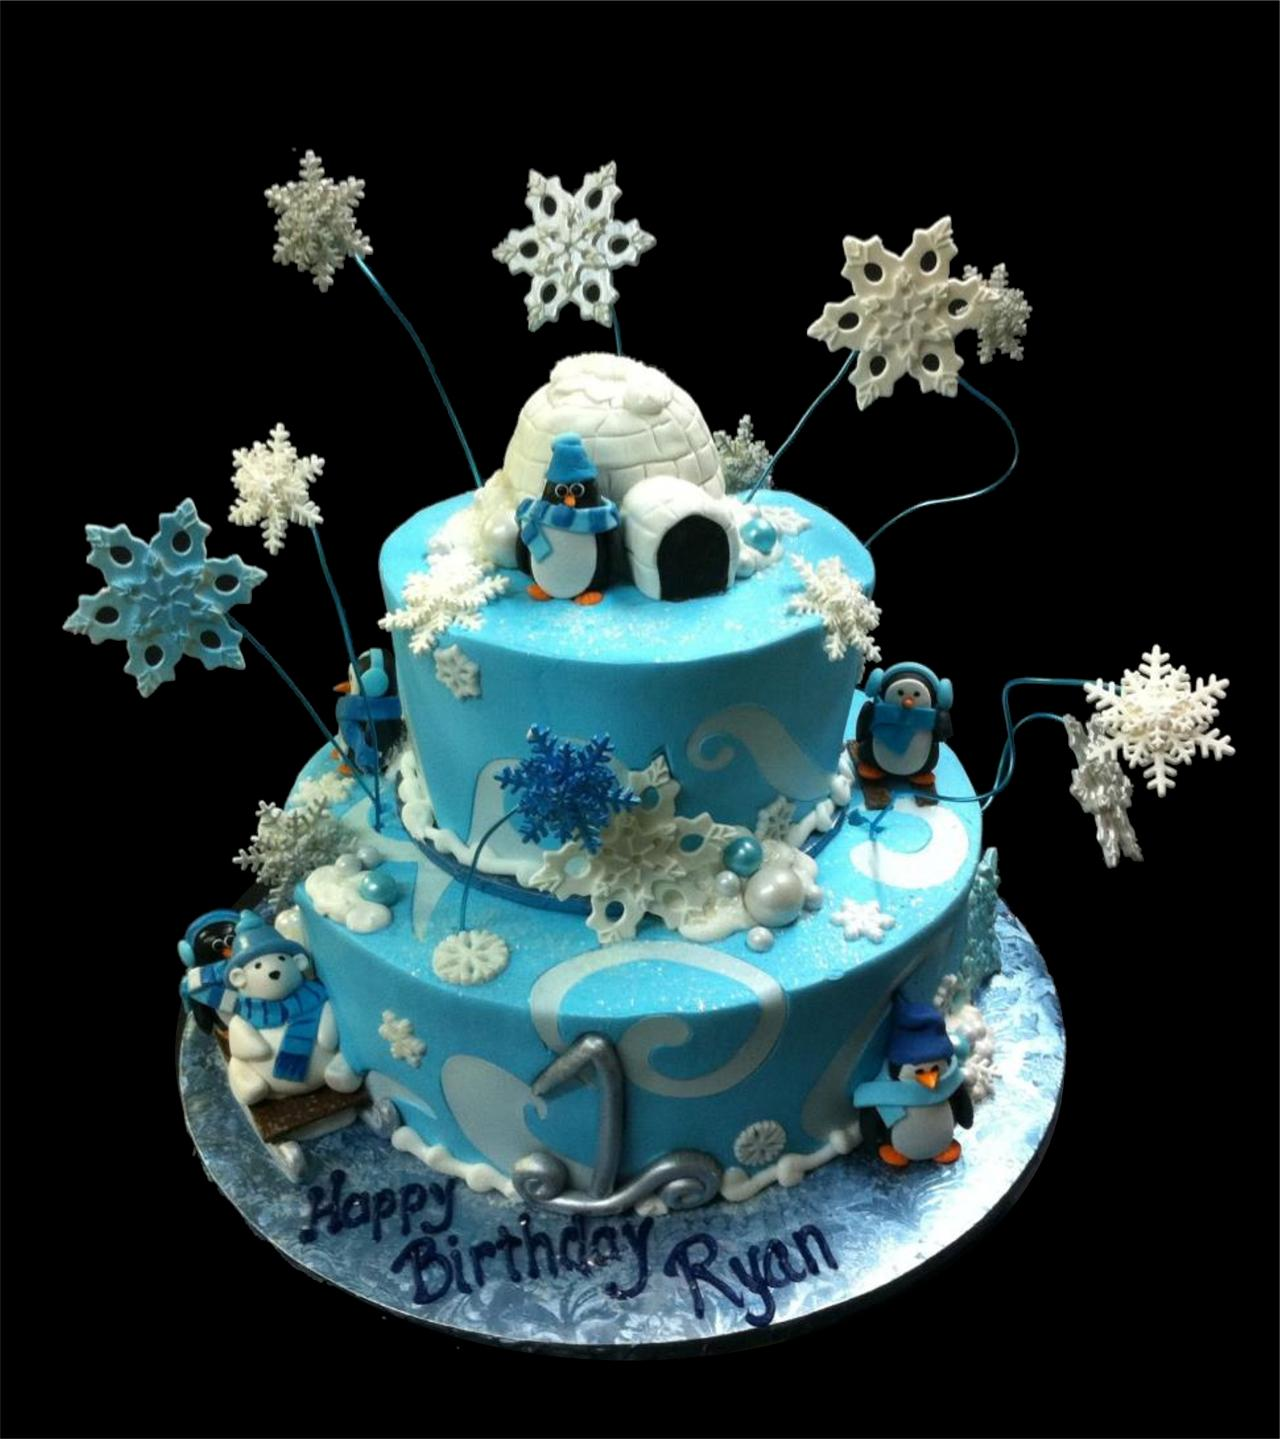 Phenomenal 9 Snow Themed Birthday Cakes Photo Ice Skating Birthday Cake Funny Birthday Cards Online Fluifree Goldxyz